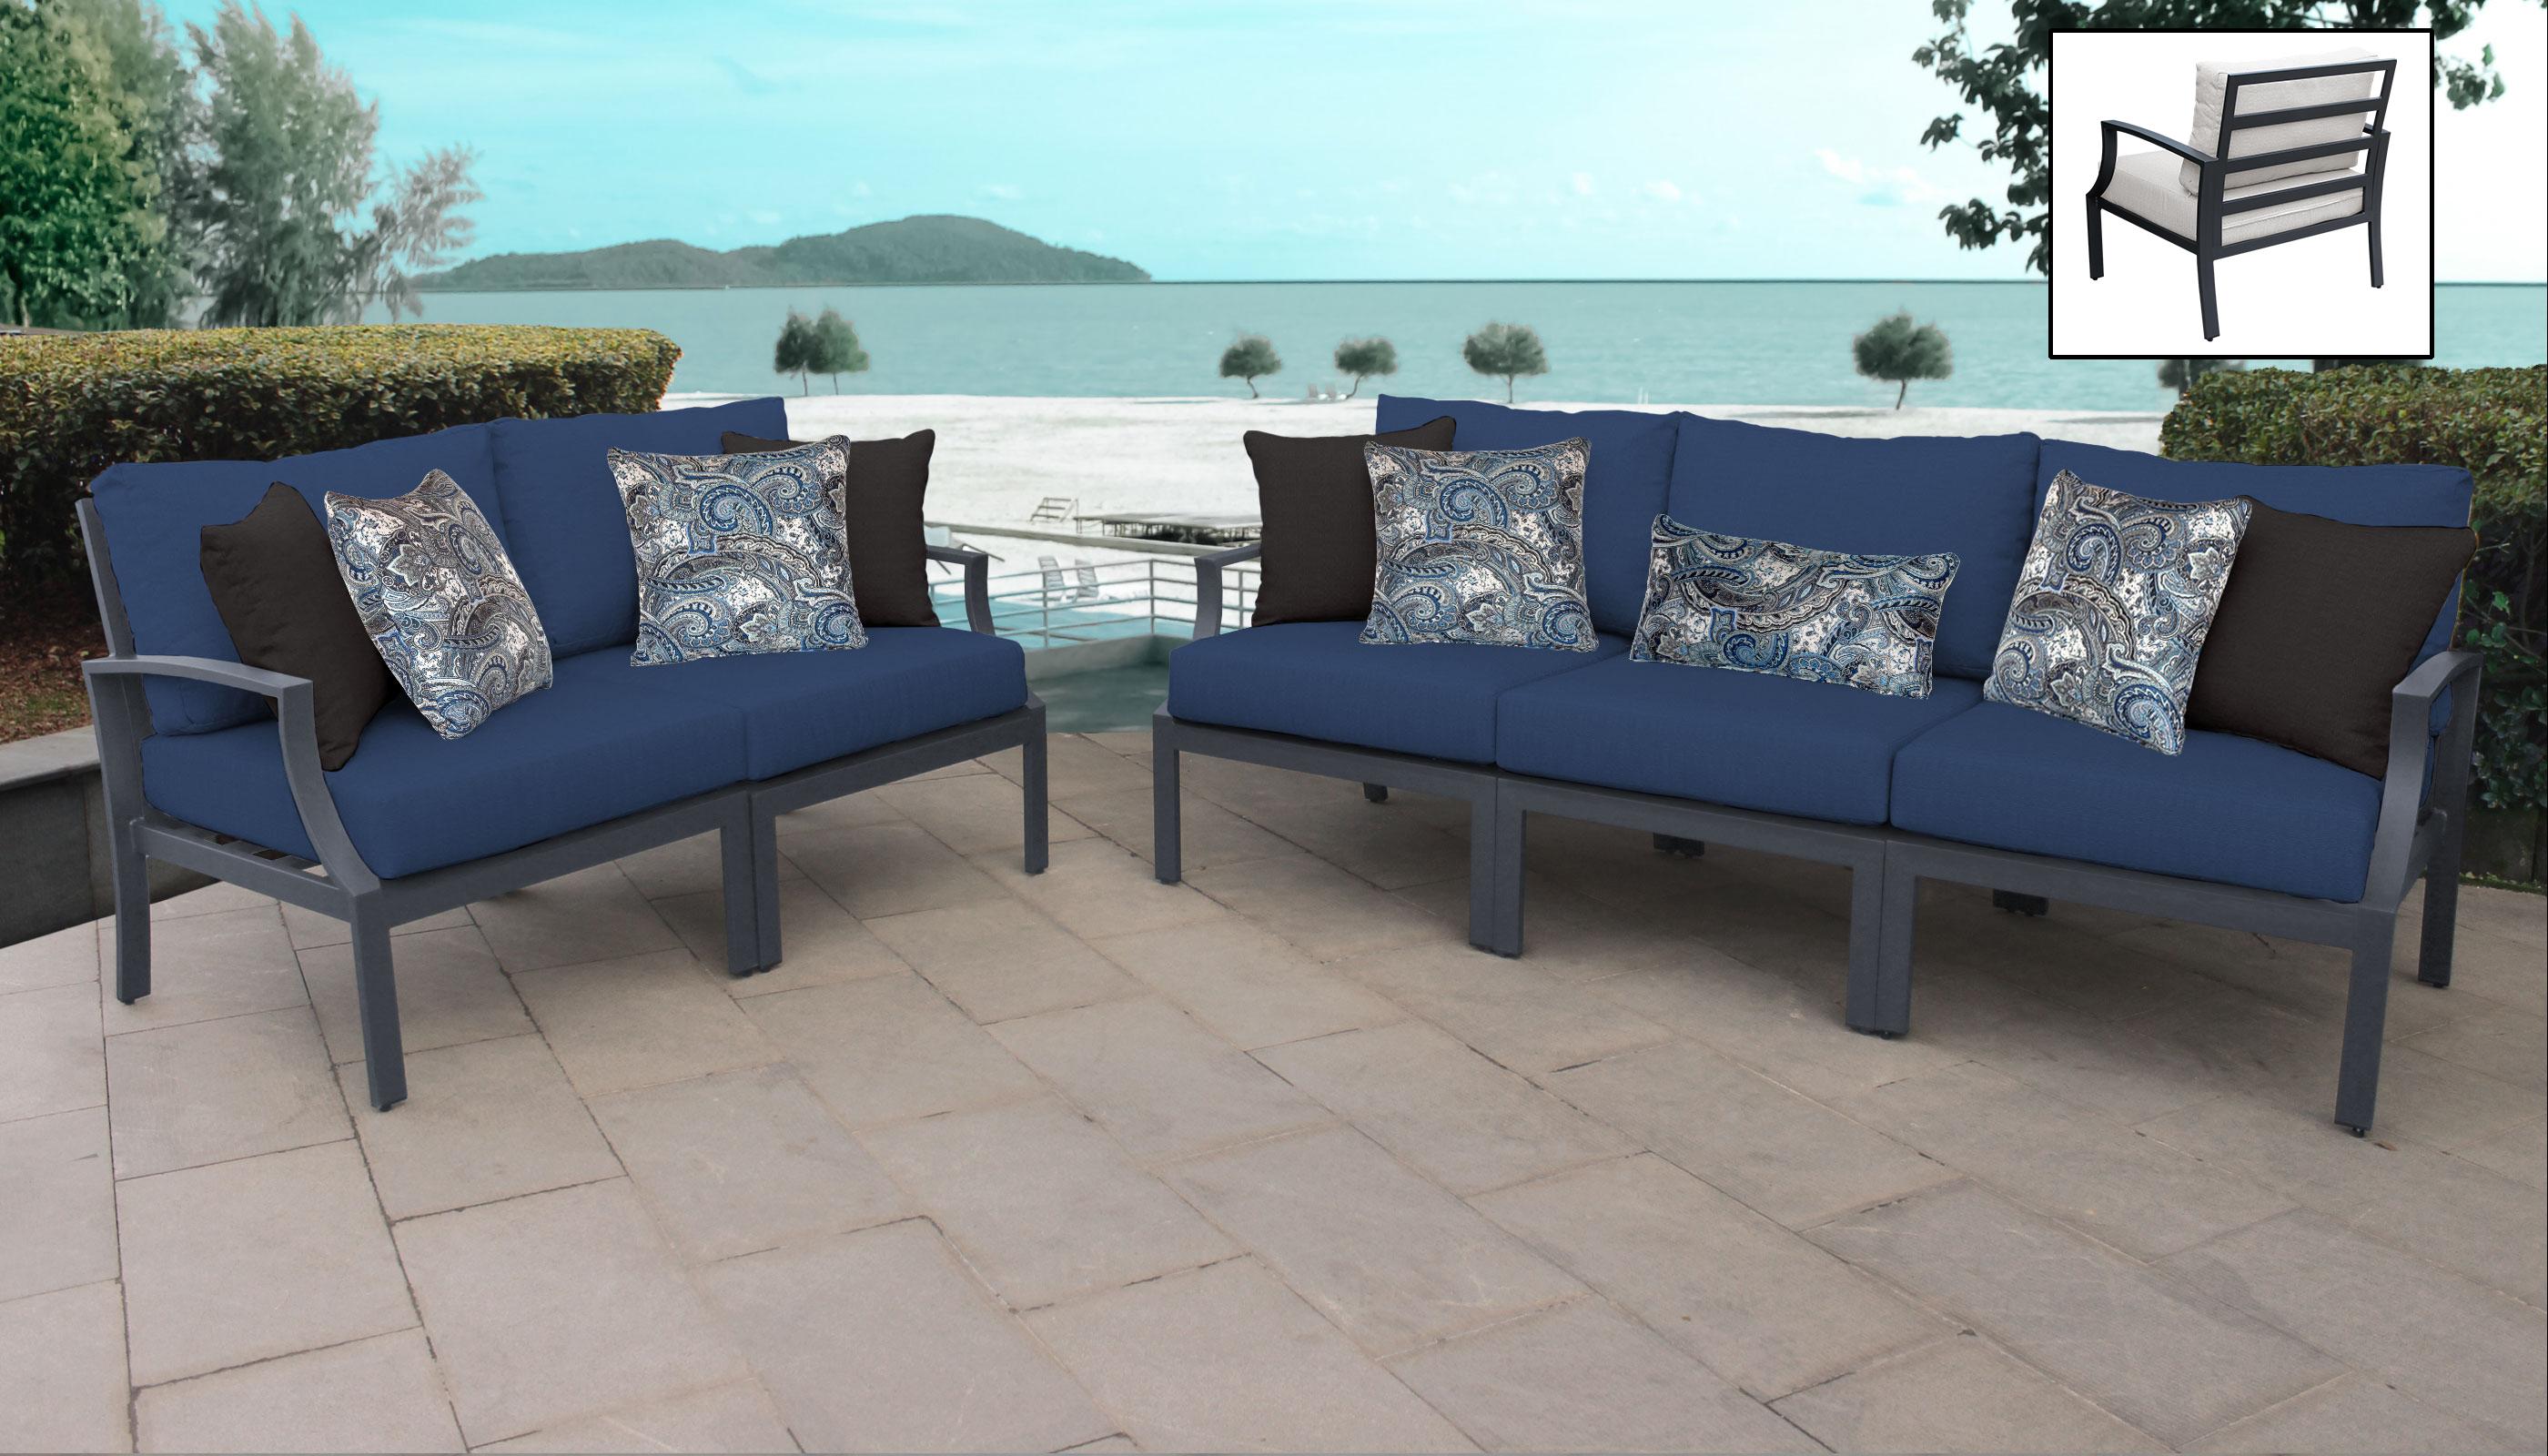 Lexington 5 Piece Outdoor Aluminum Patio Furniture Set 05a - TK Classics